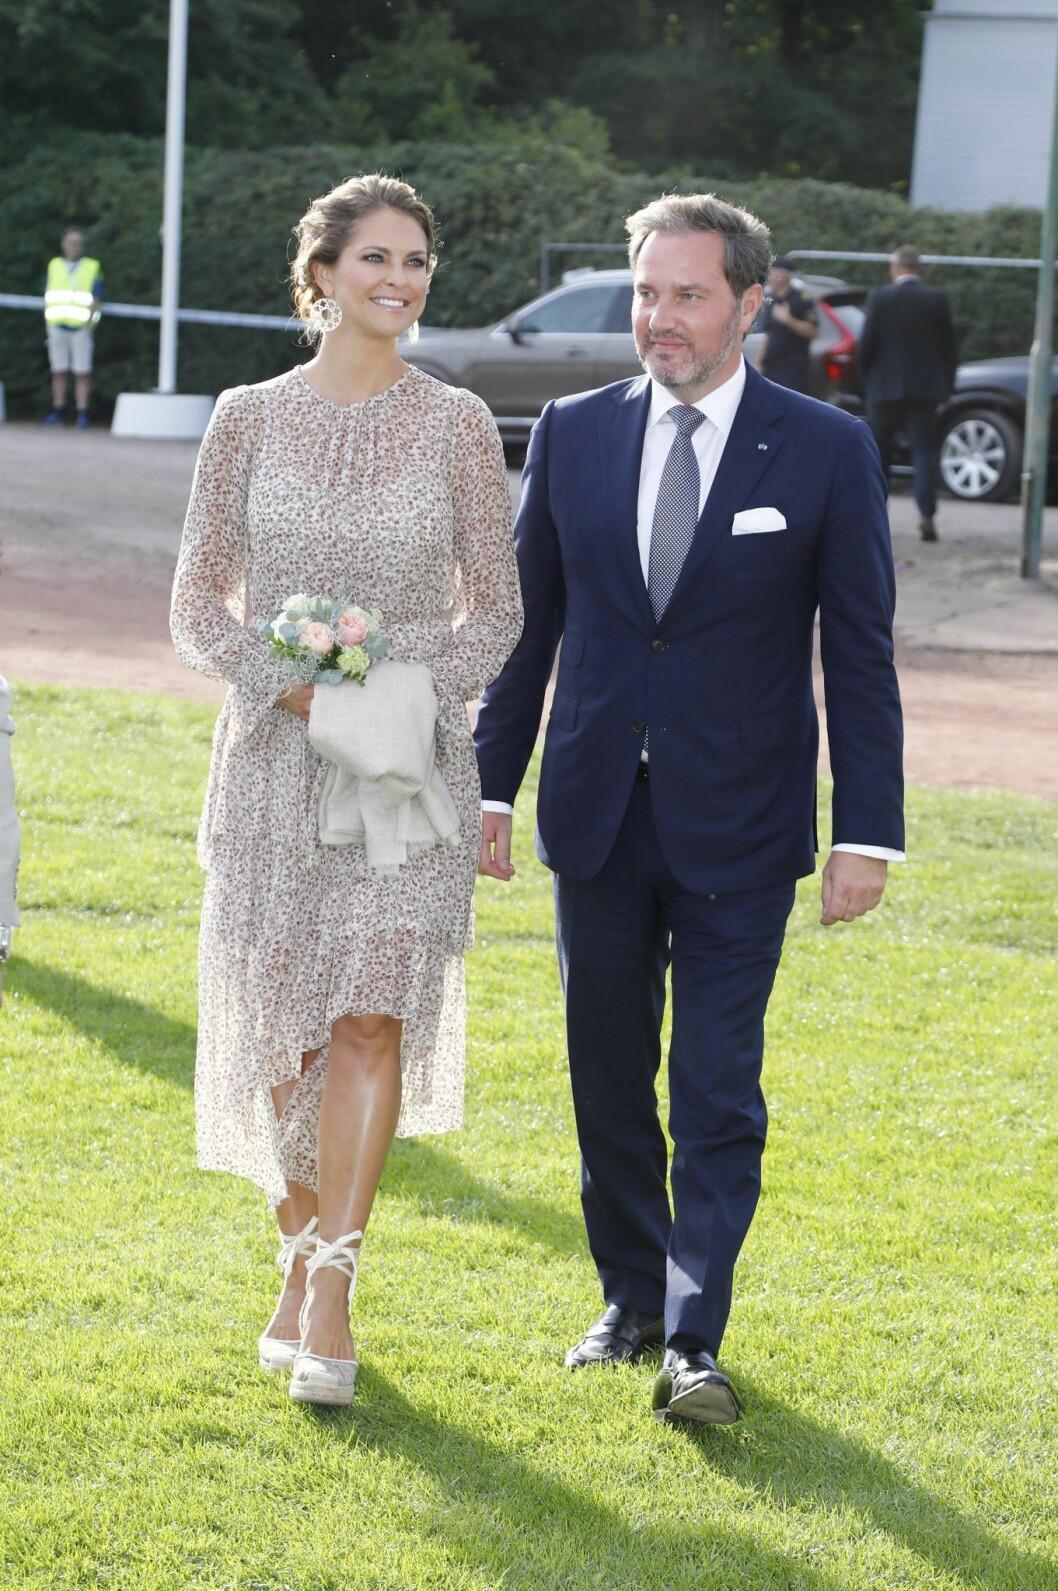 Prinsessan Madeleine i en beige klänning med Chris vid sin sida